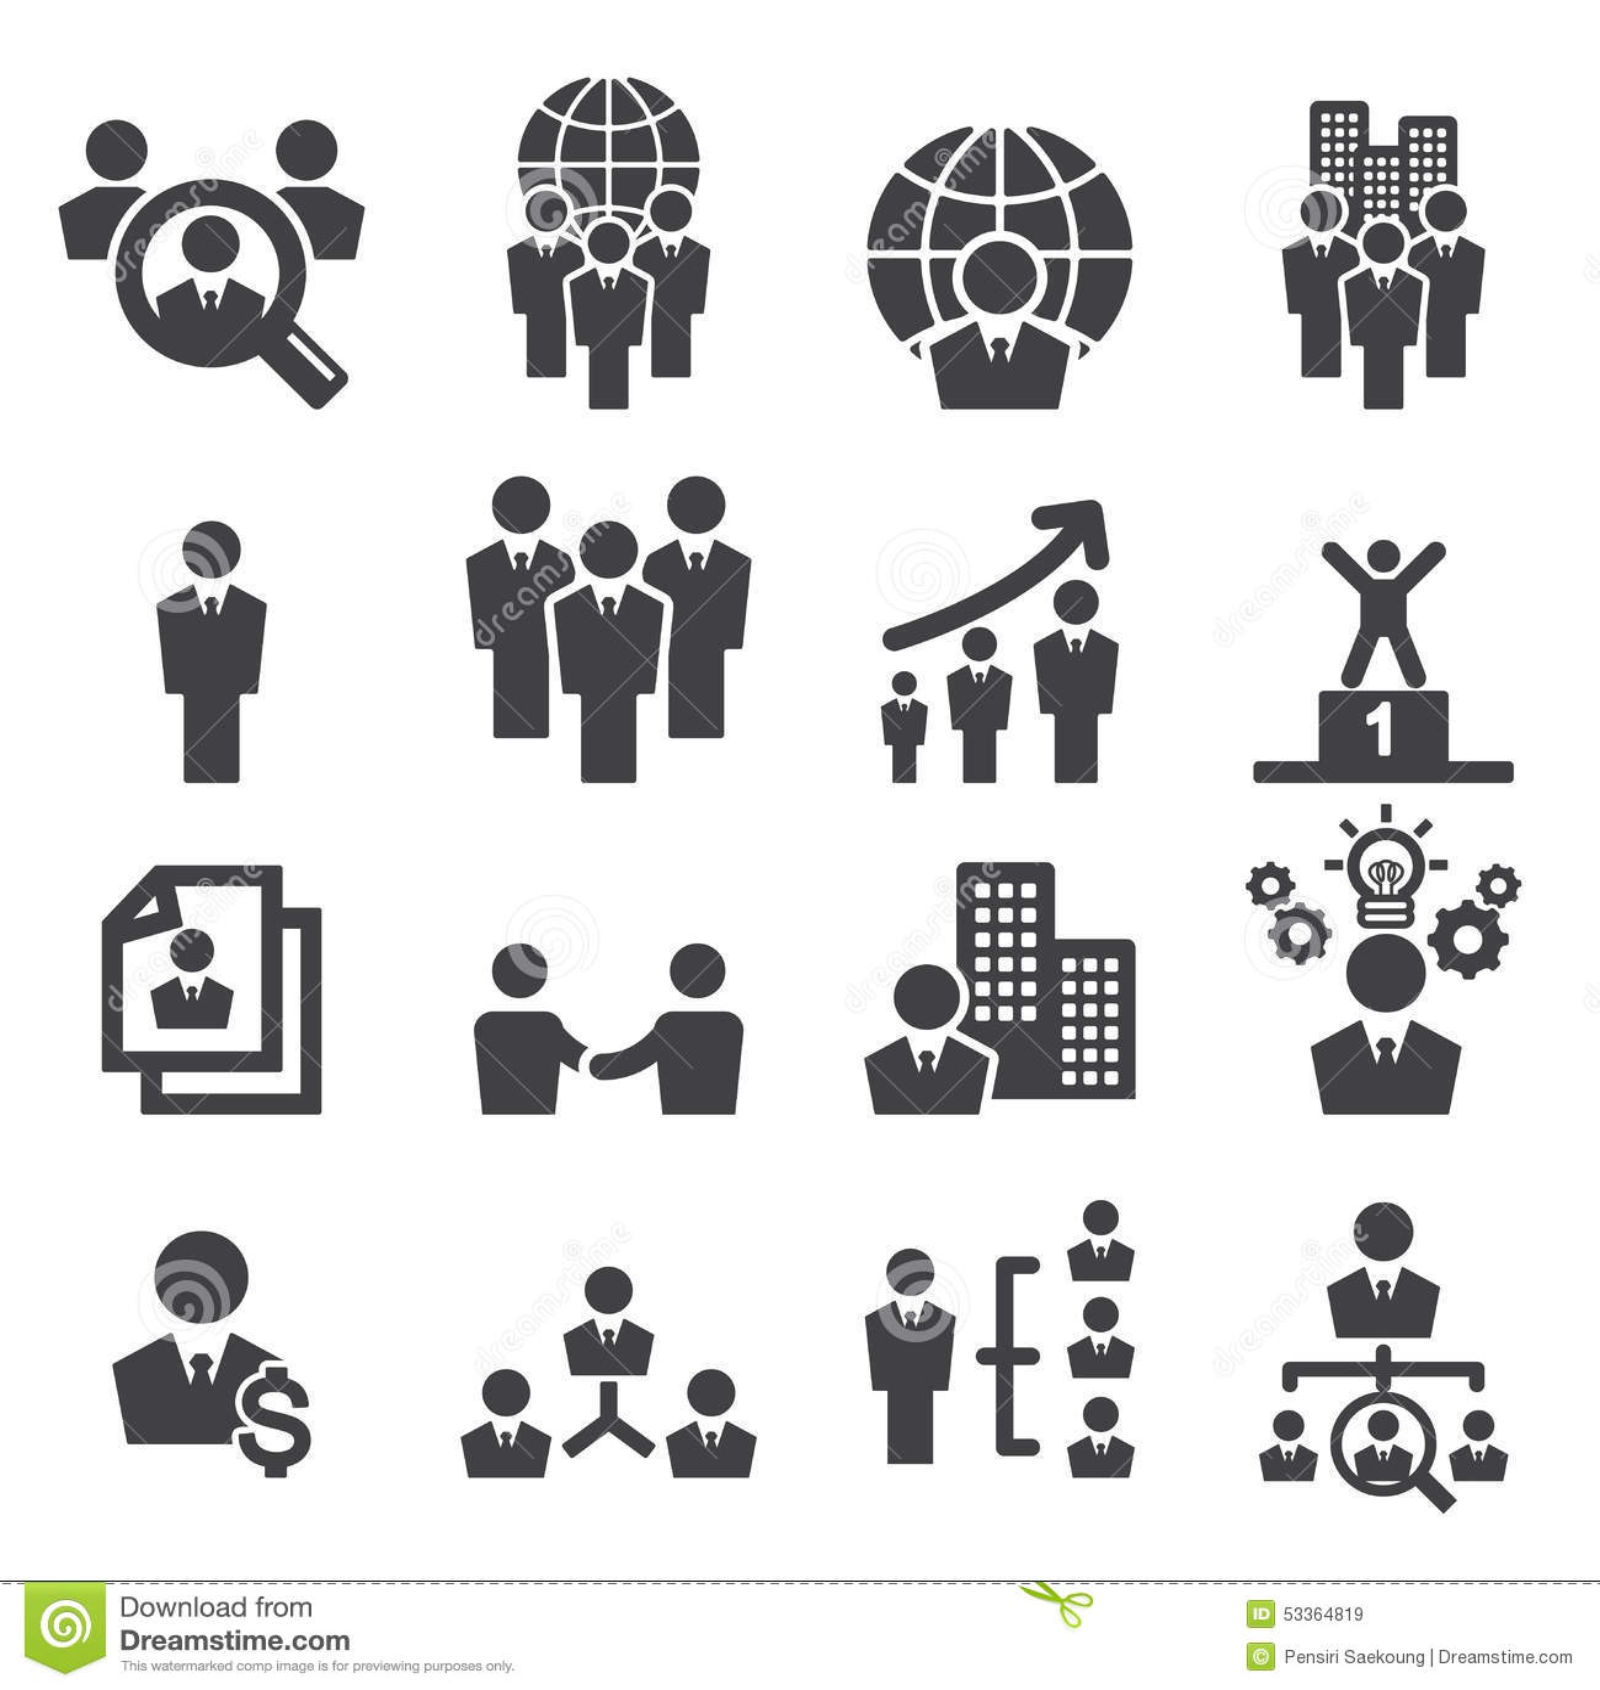 human resources icon stock vector illustration of office parents arguing clipart argument clip art men